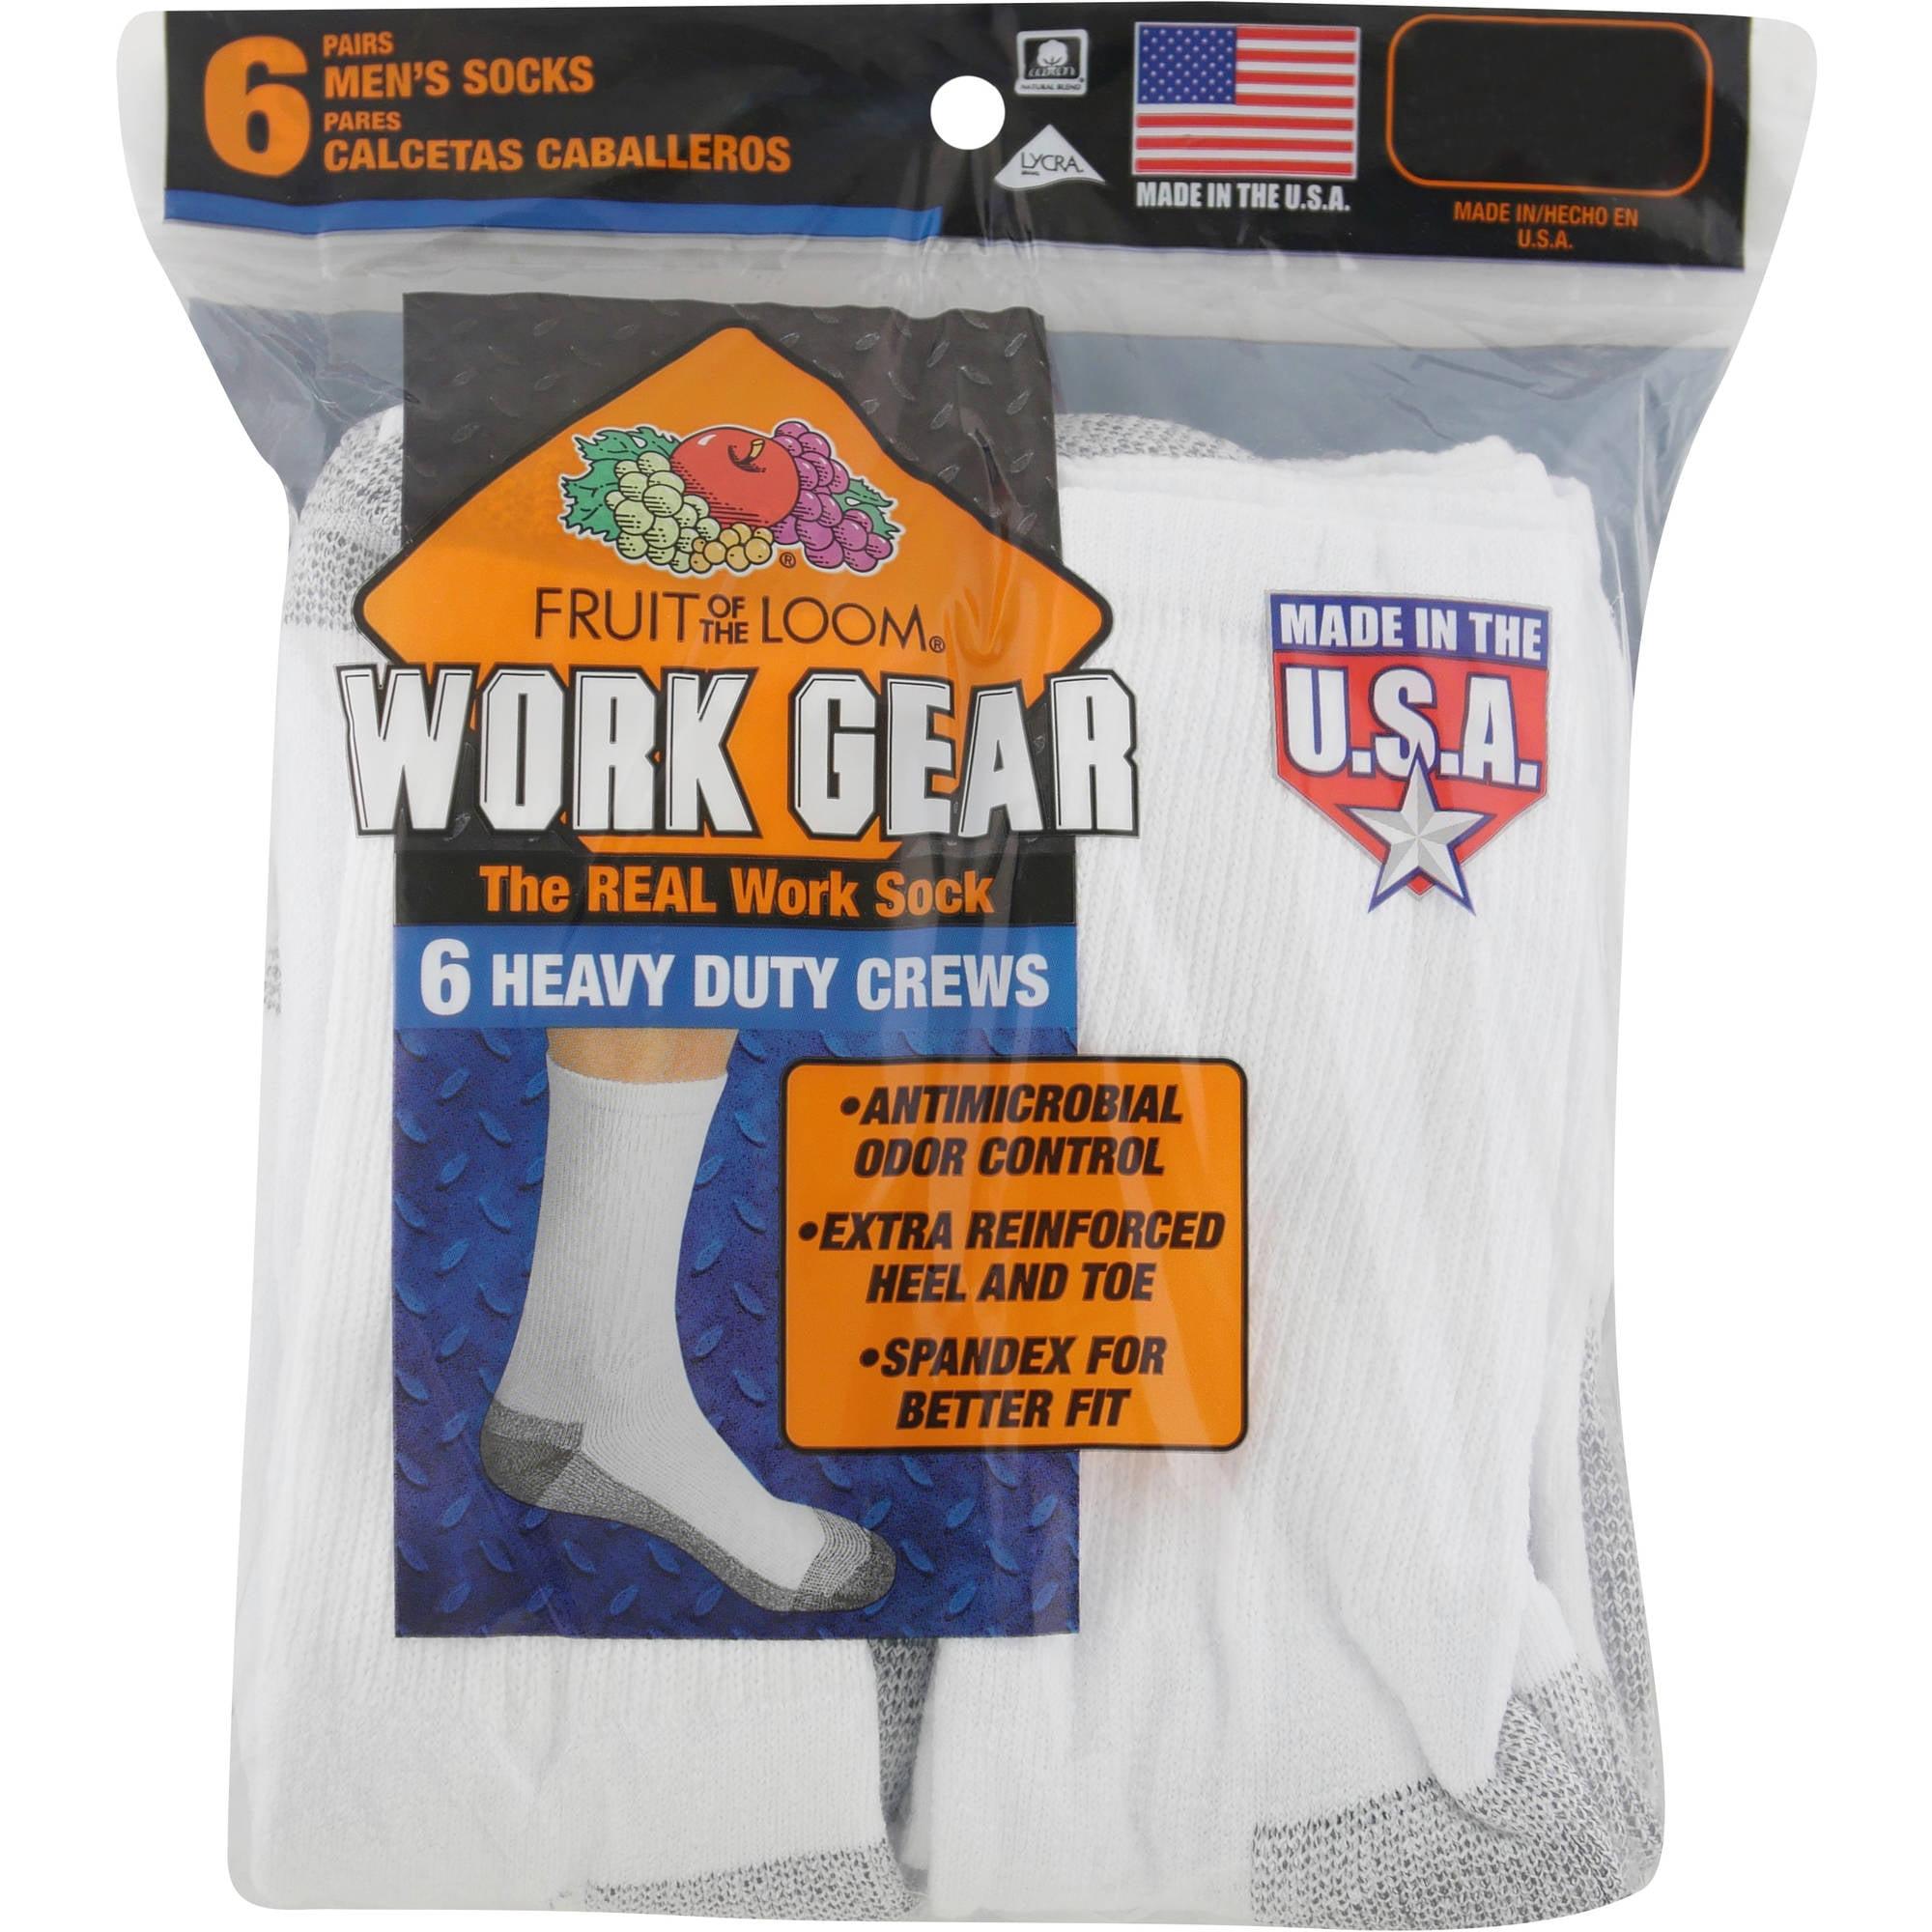 Fruit of the Loom Mens 6 Pack Heavy Duty Cushioned Crew Socks